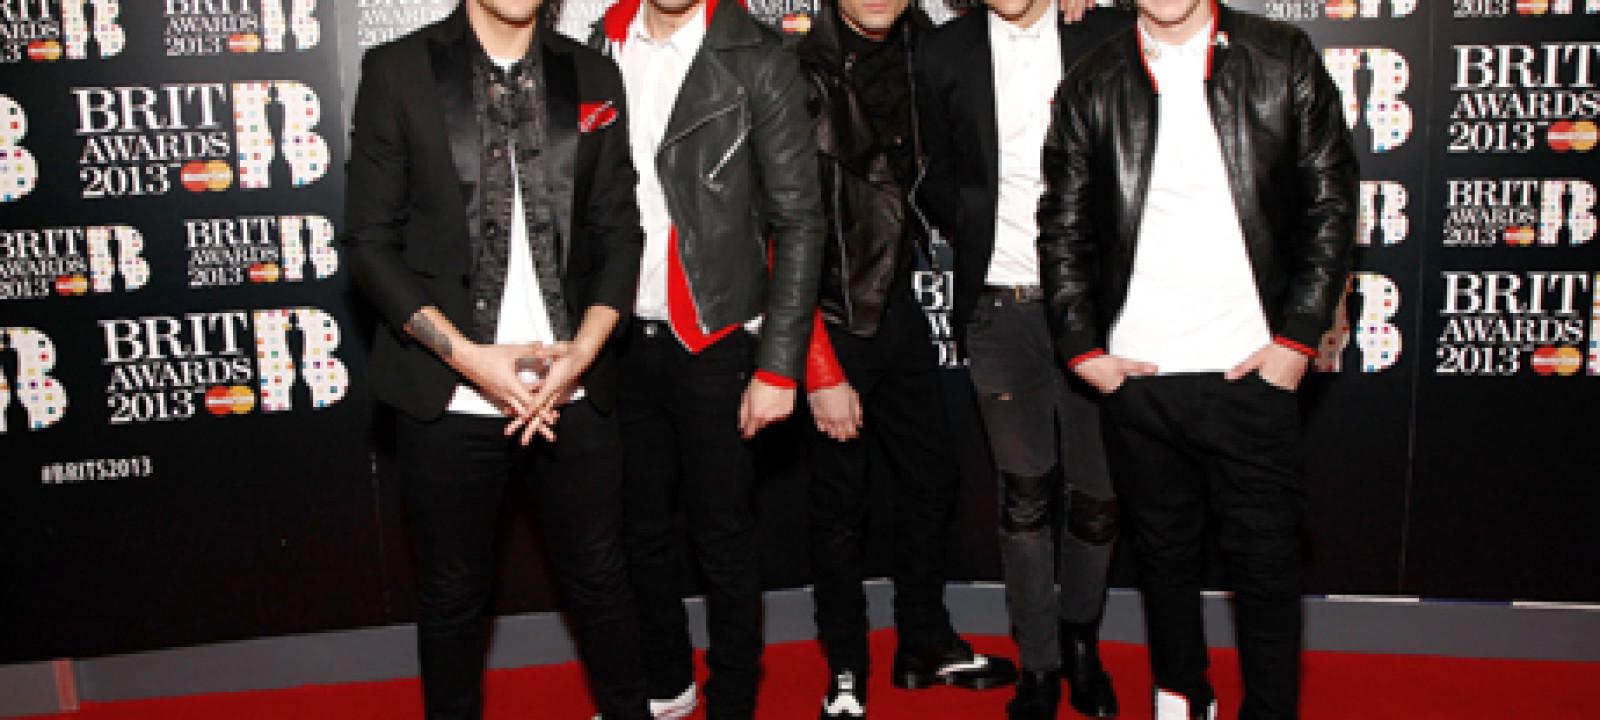 Niall Horan, Louis Tomlinson, Liam Payne, Zayn Malik, Harry Styles